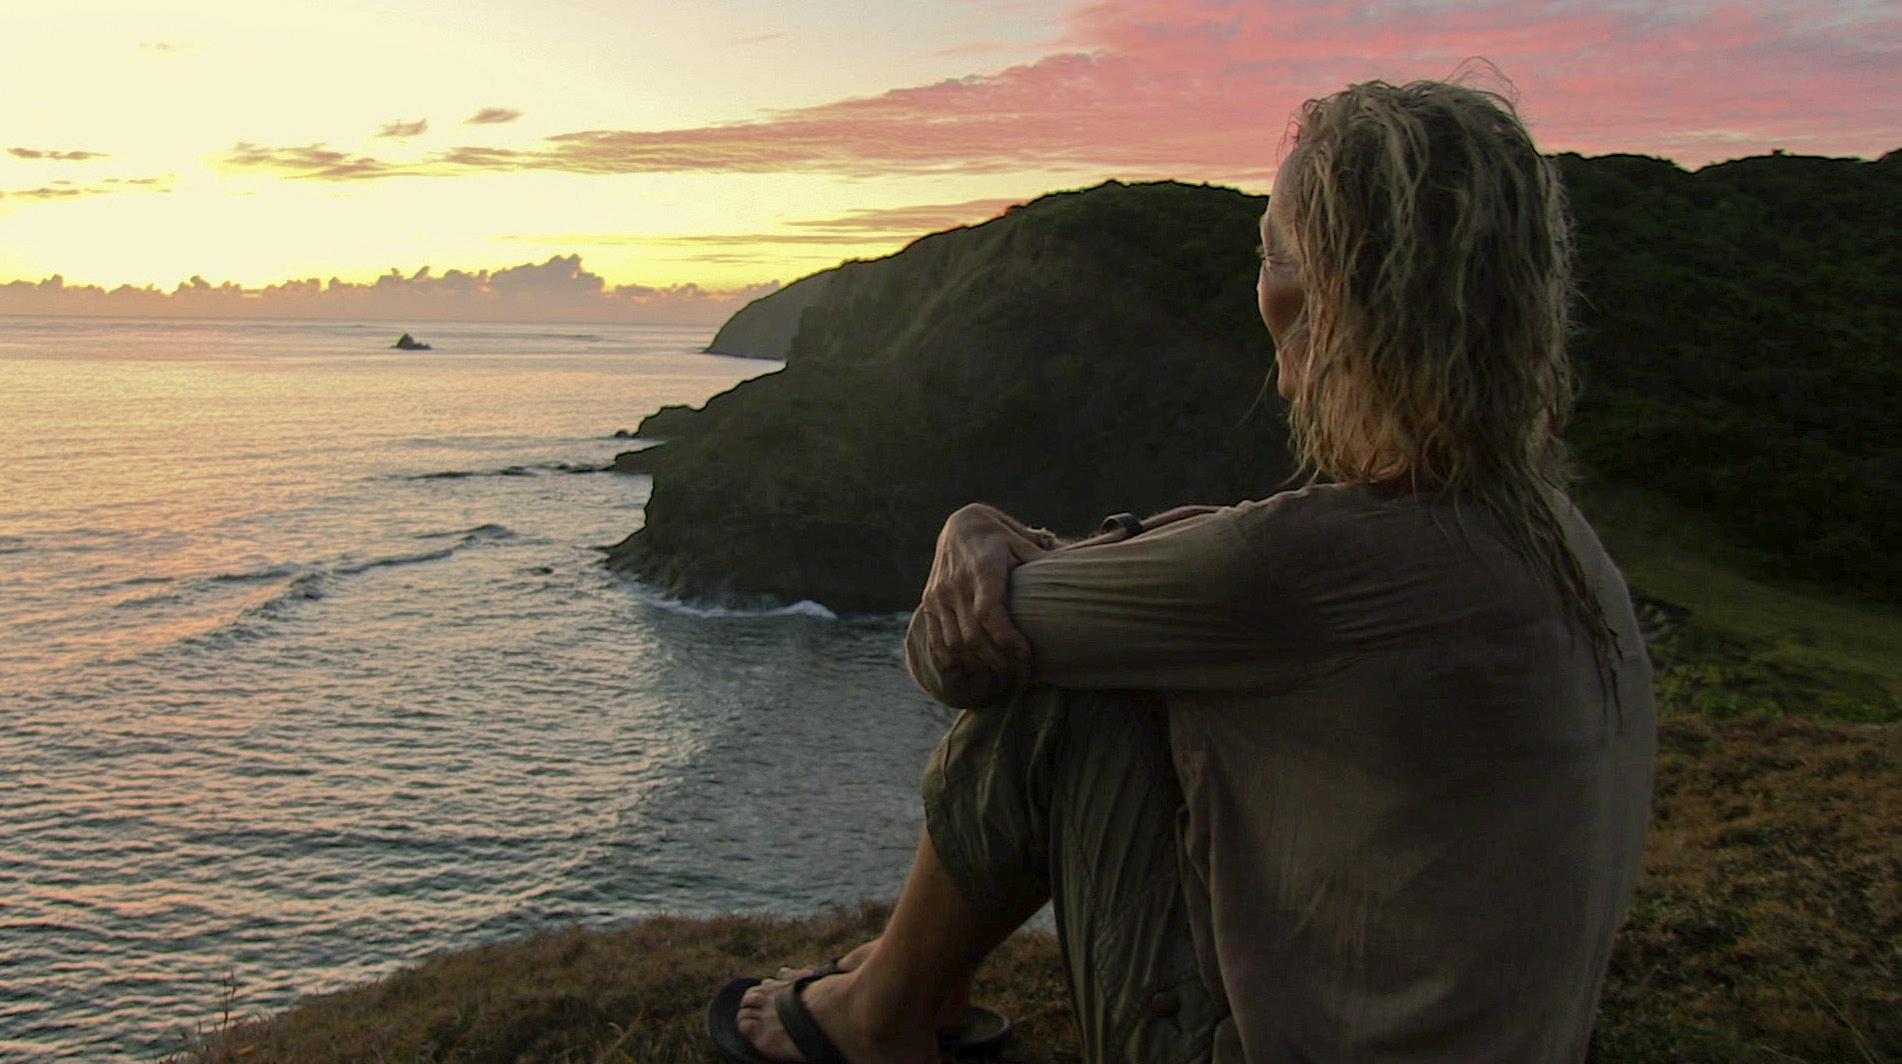 Tina enjoys the sunrise in the Season 27 Finale